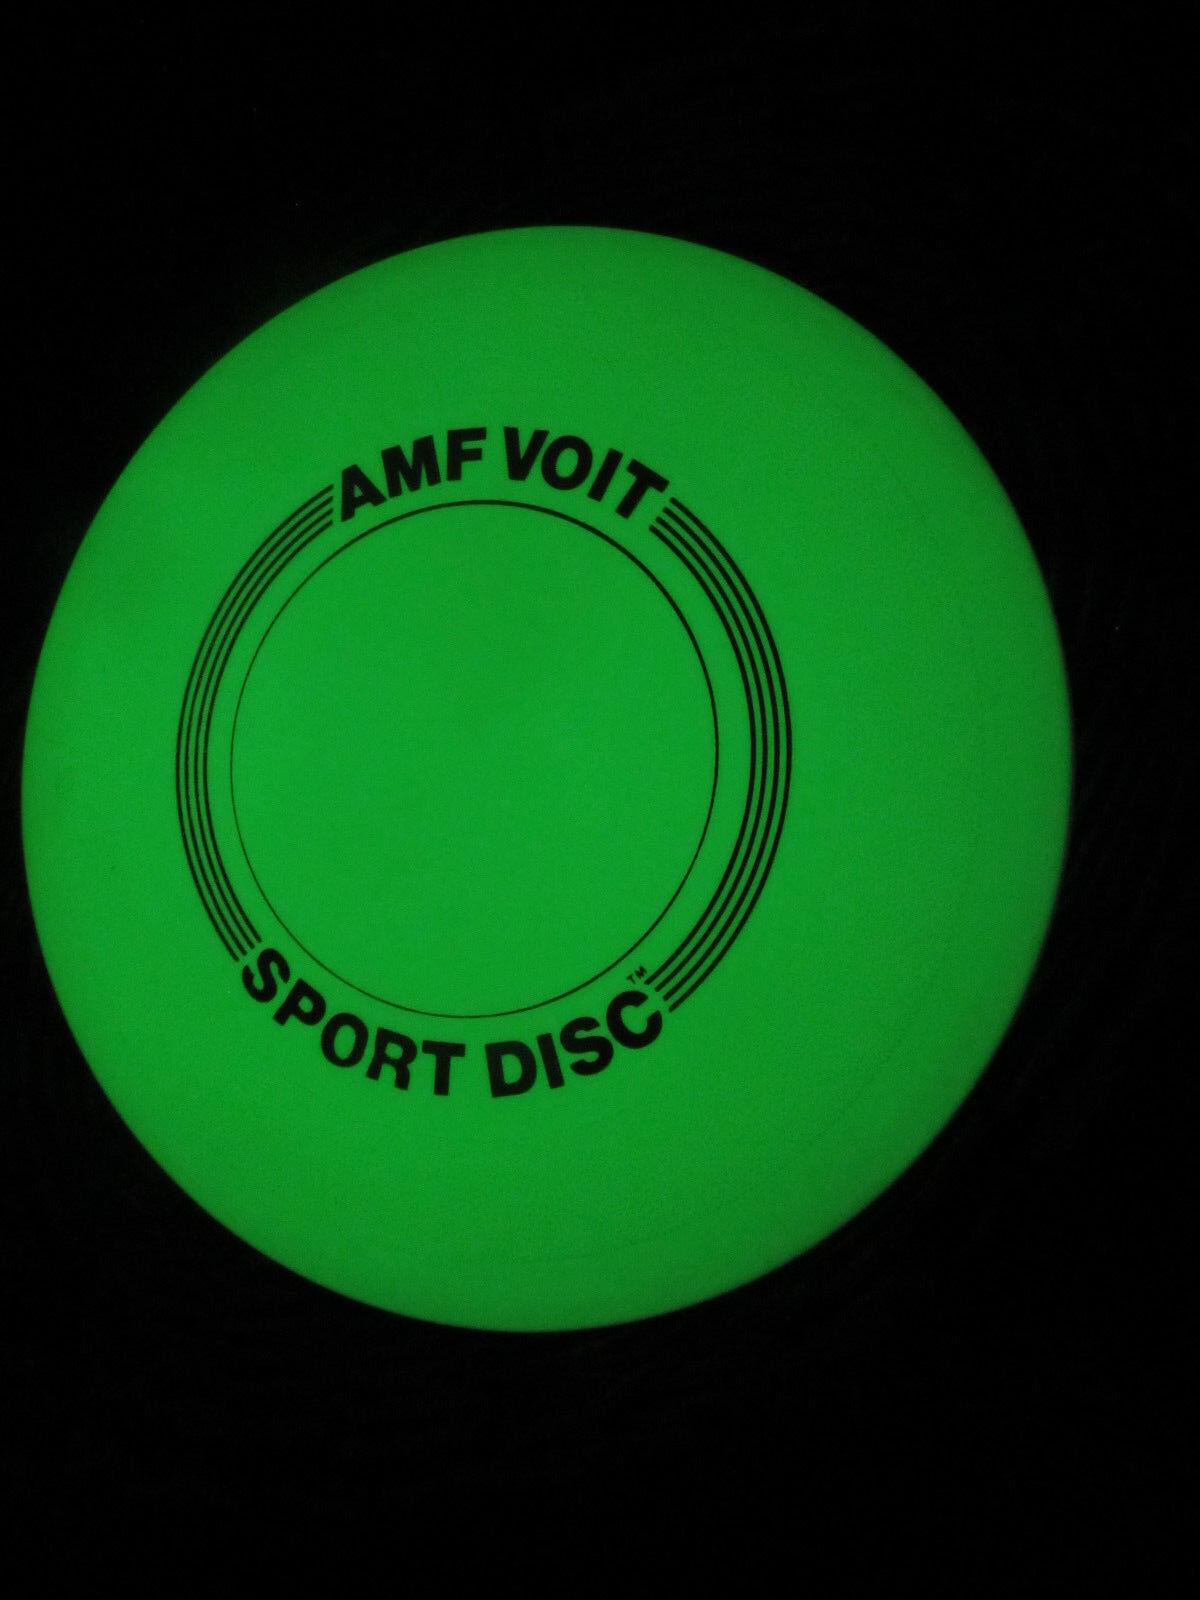 AMF VOIT HTF Vintage 200 grams GLOW IN THE DARK VERY RARE NICE DISC Sport